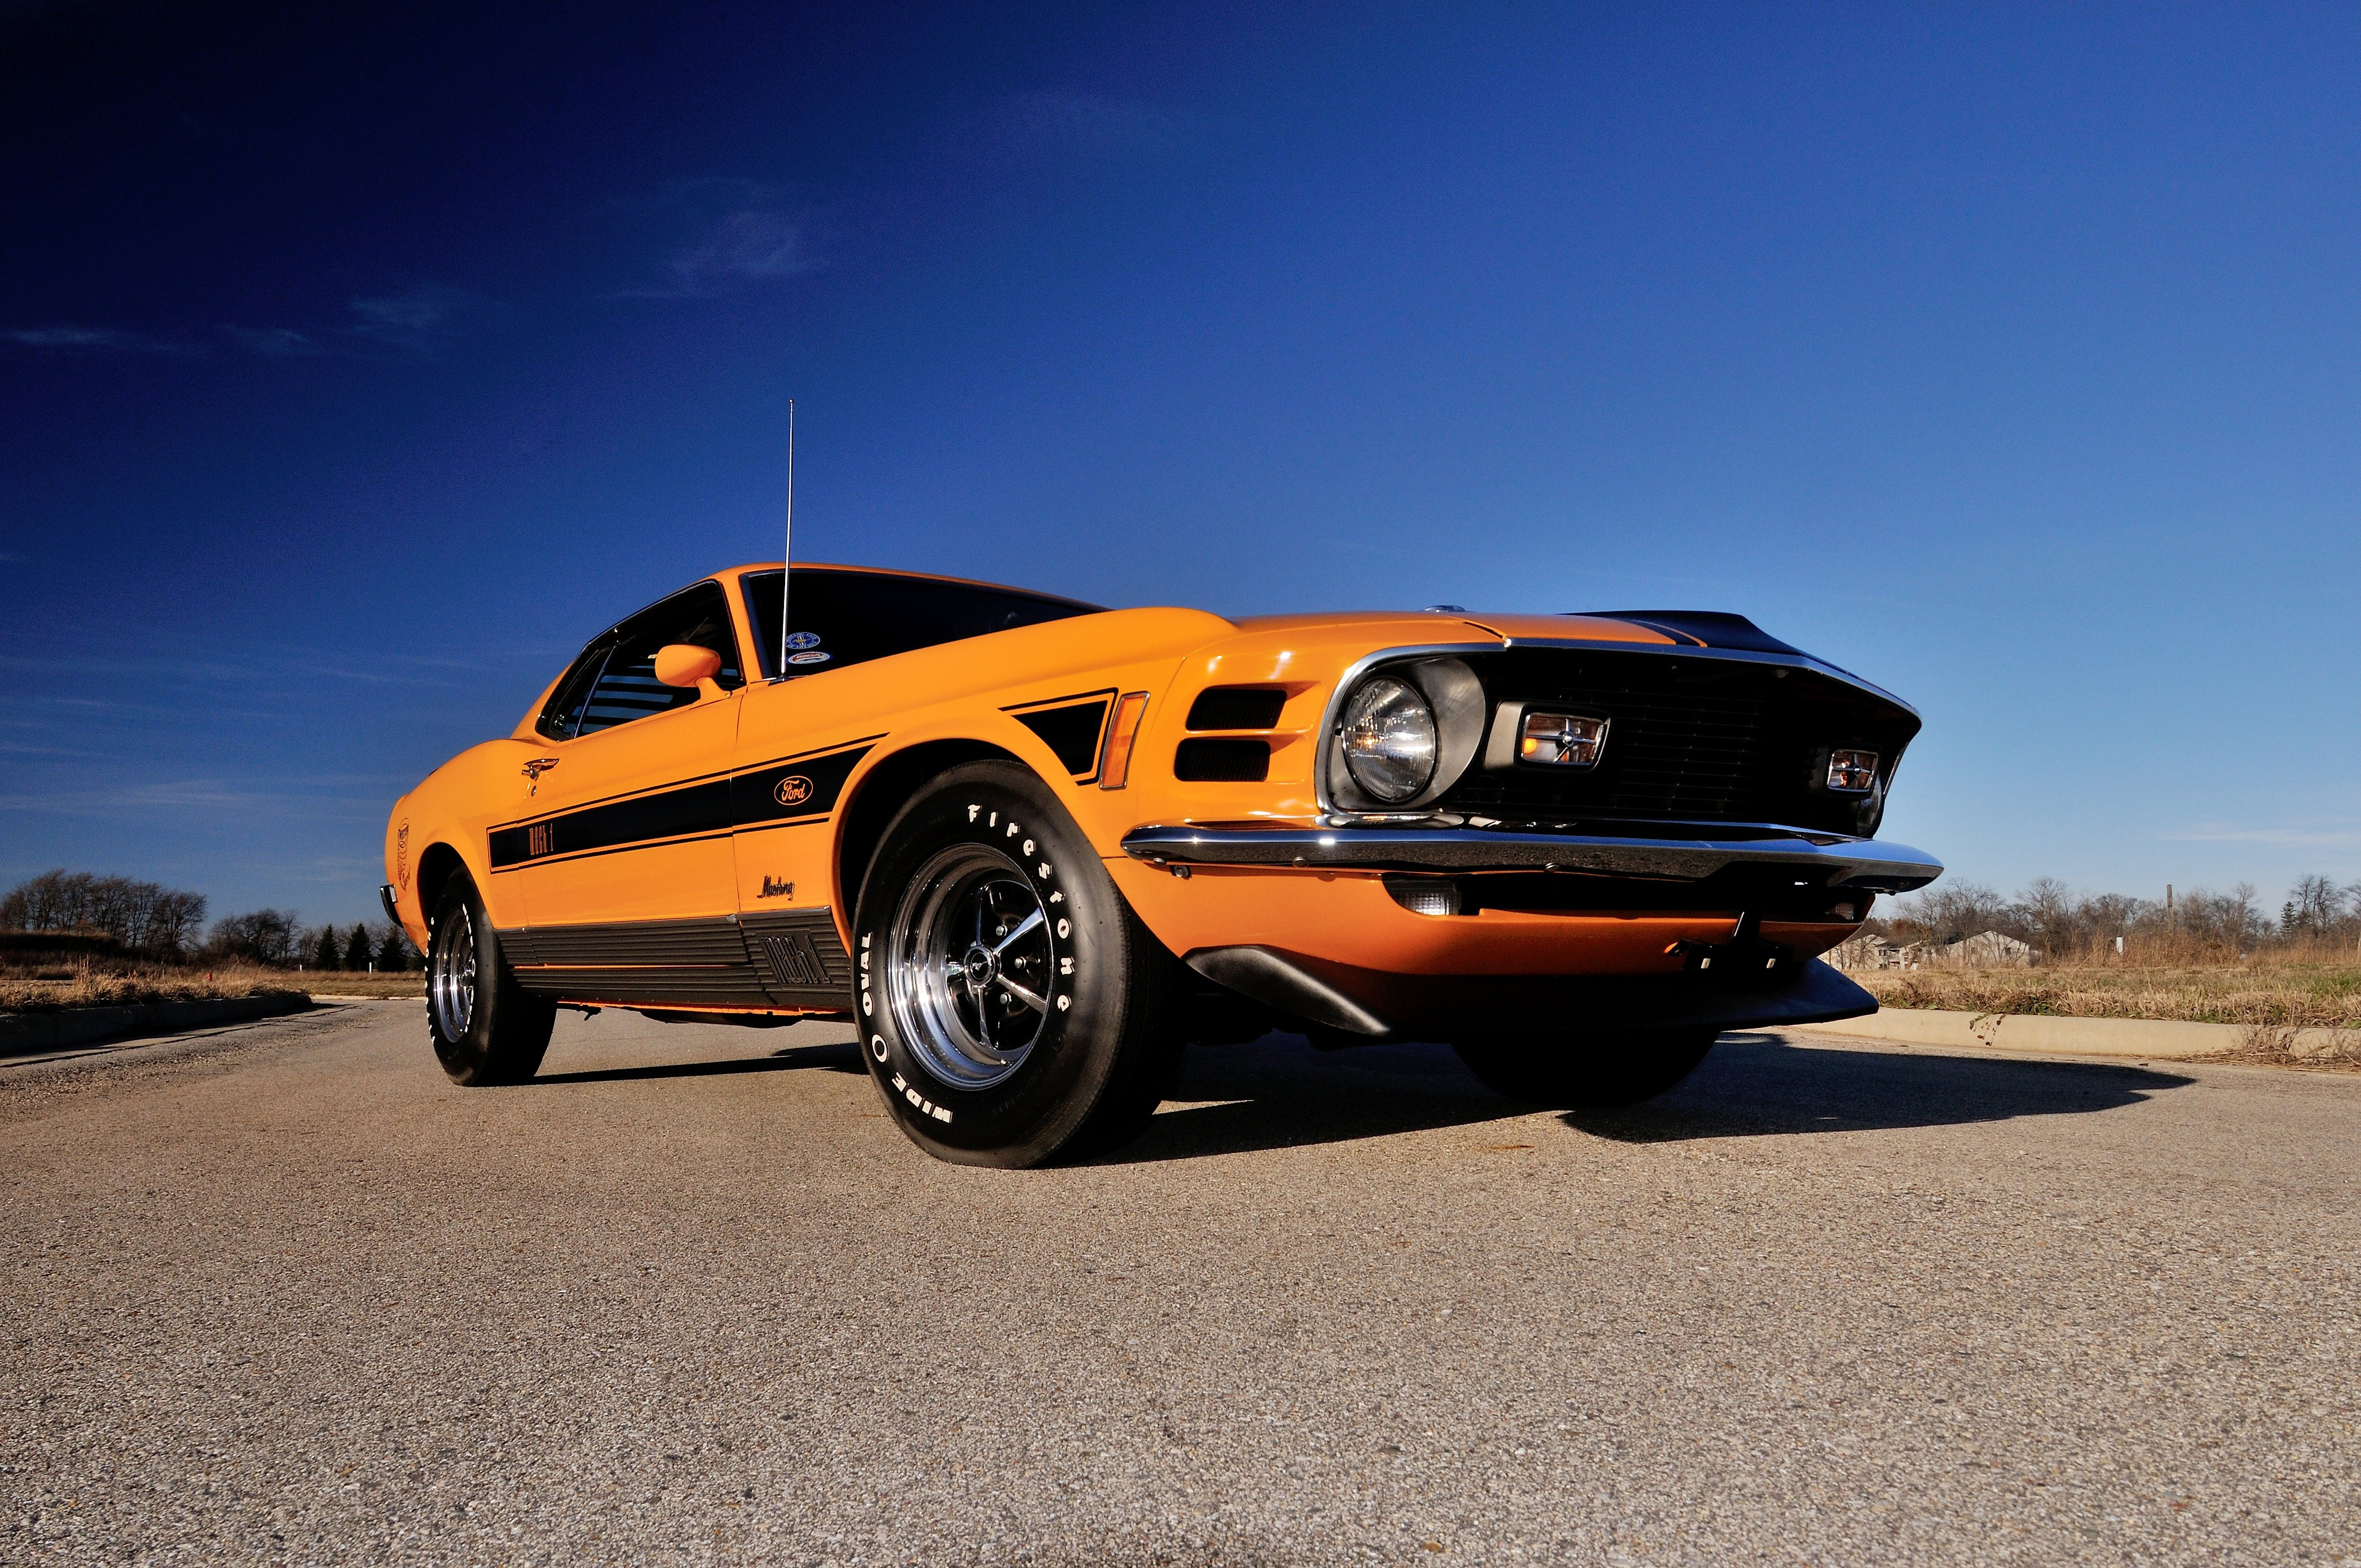 1970 ford mustang mach 1 428 super cobra jet twister muscle classic wallpaper 4096x2720 516271 wallpaperup